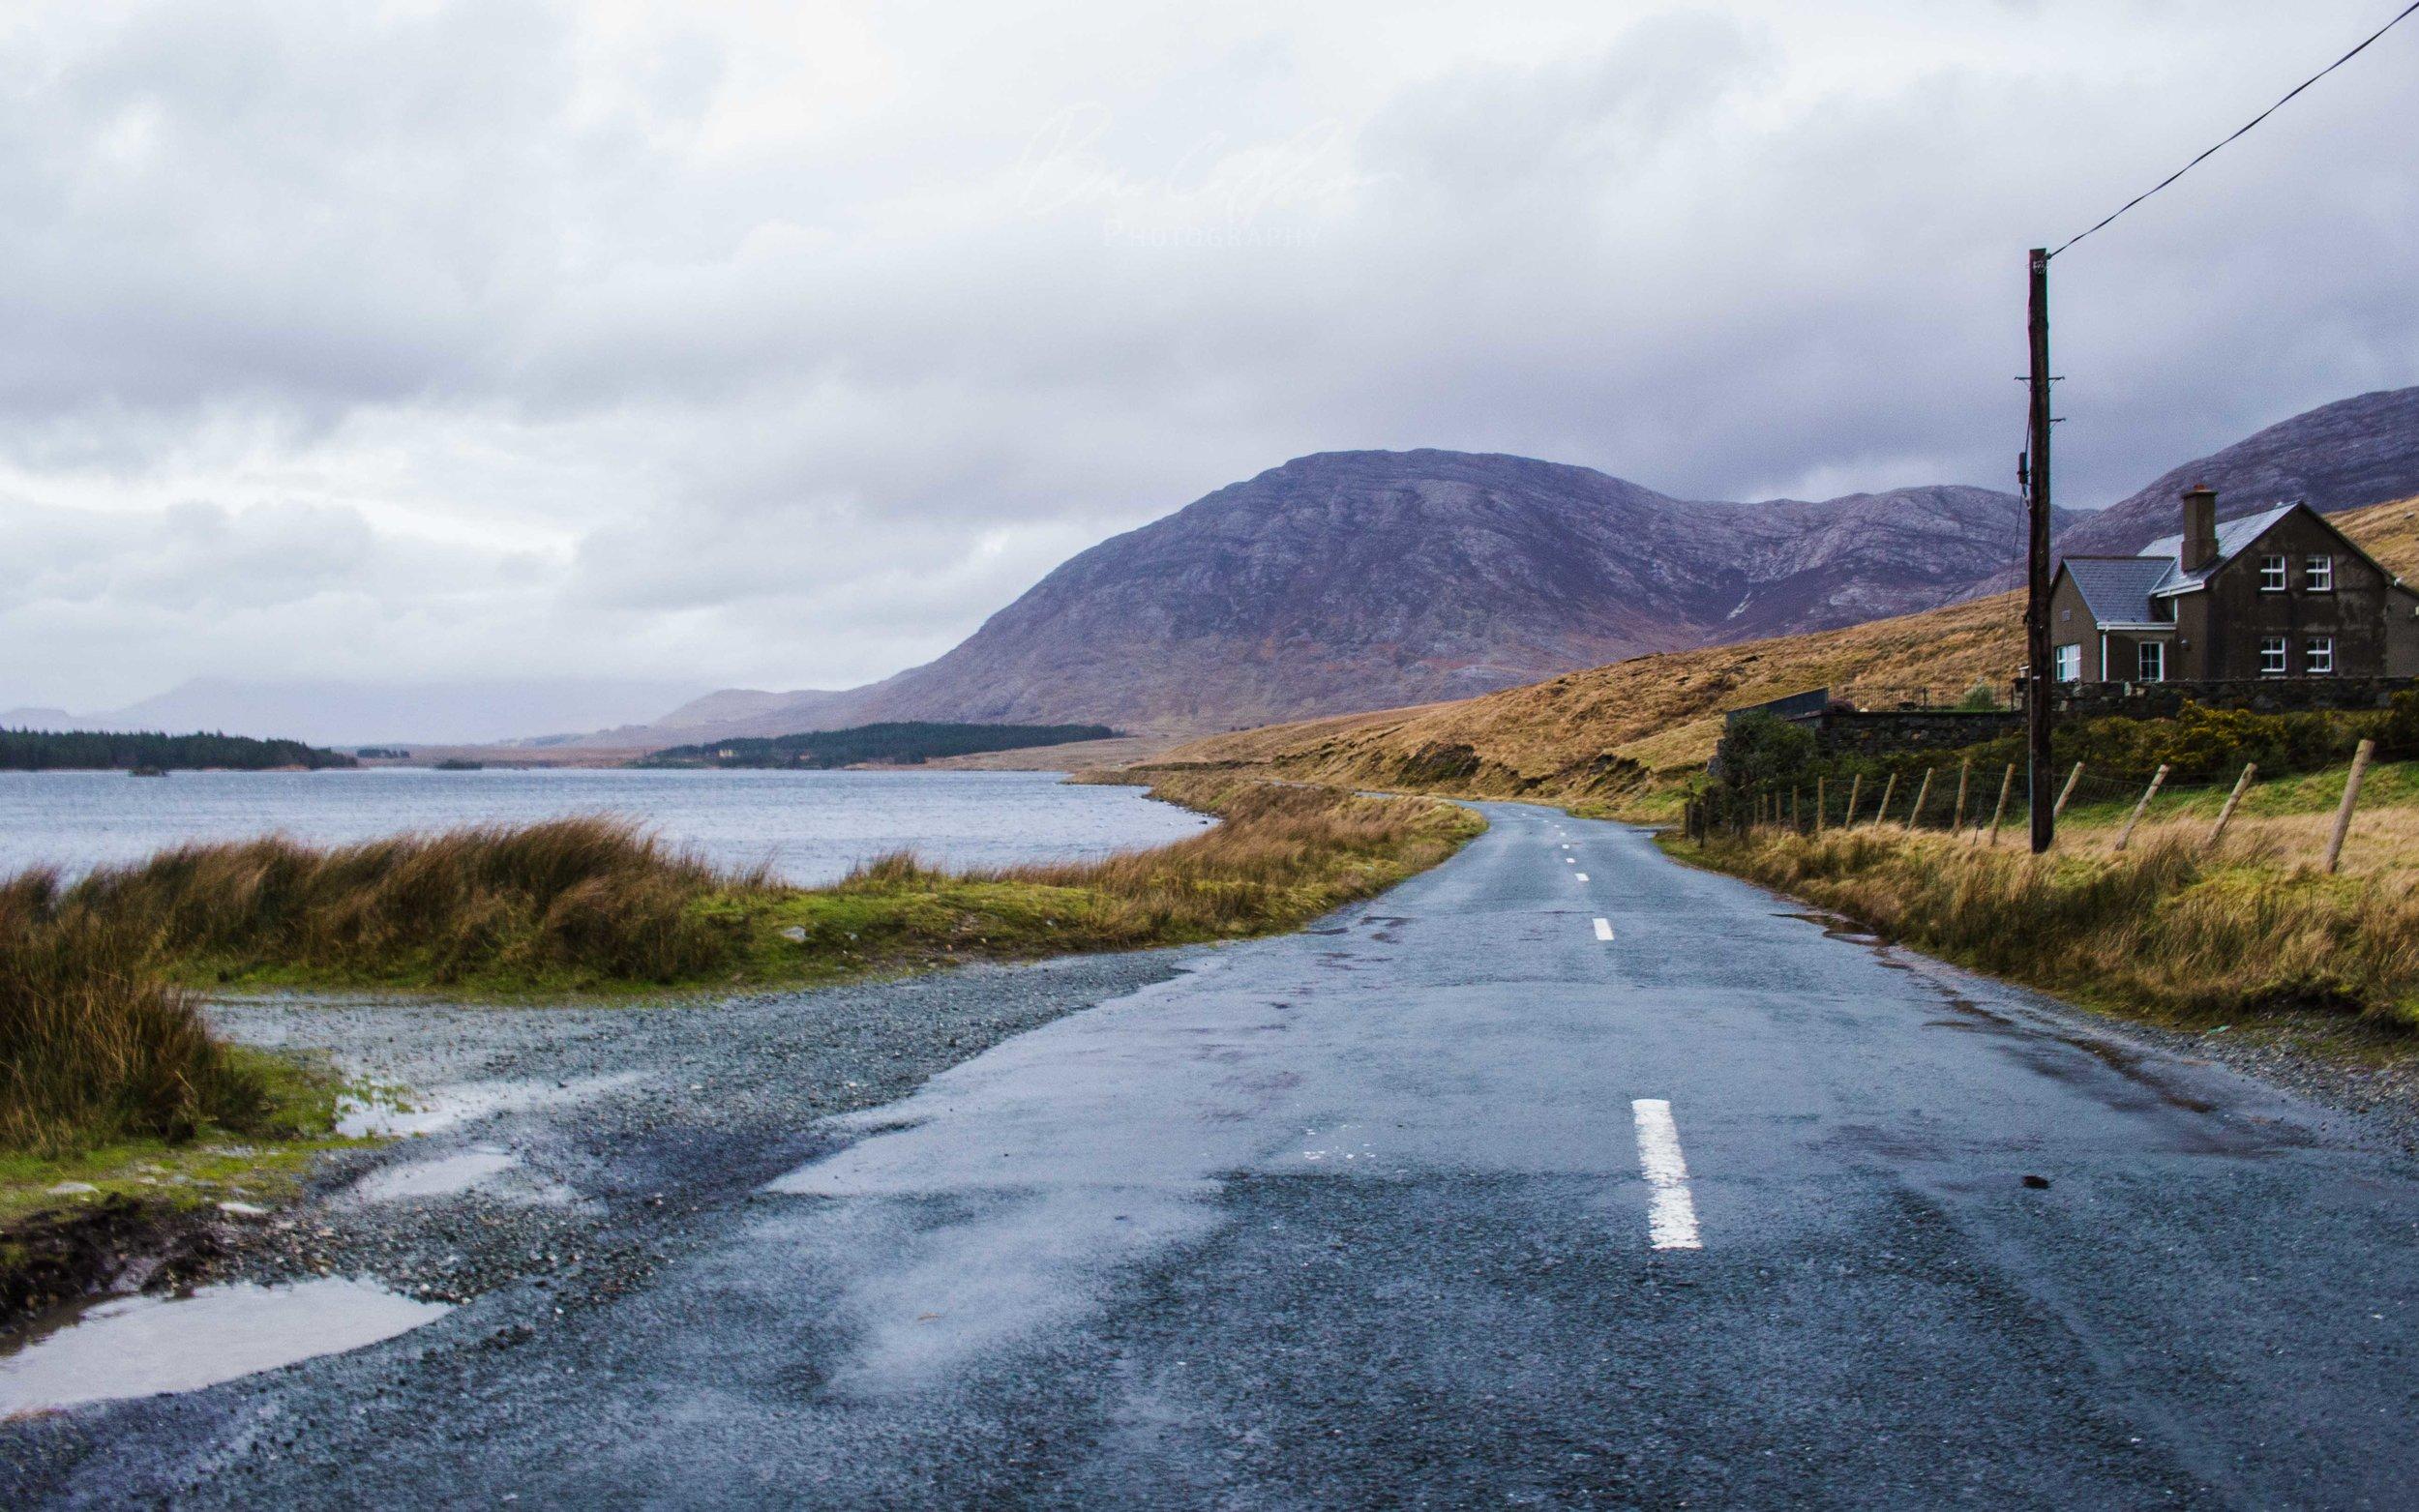 The Road to Connemara, Ireland.